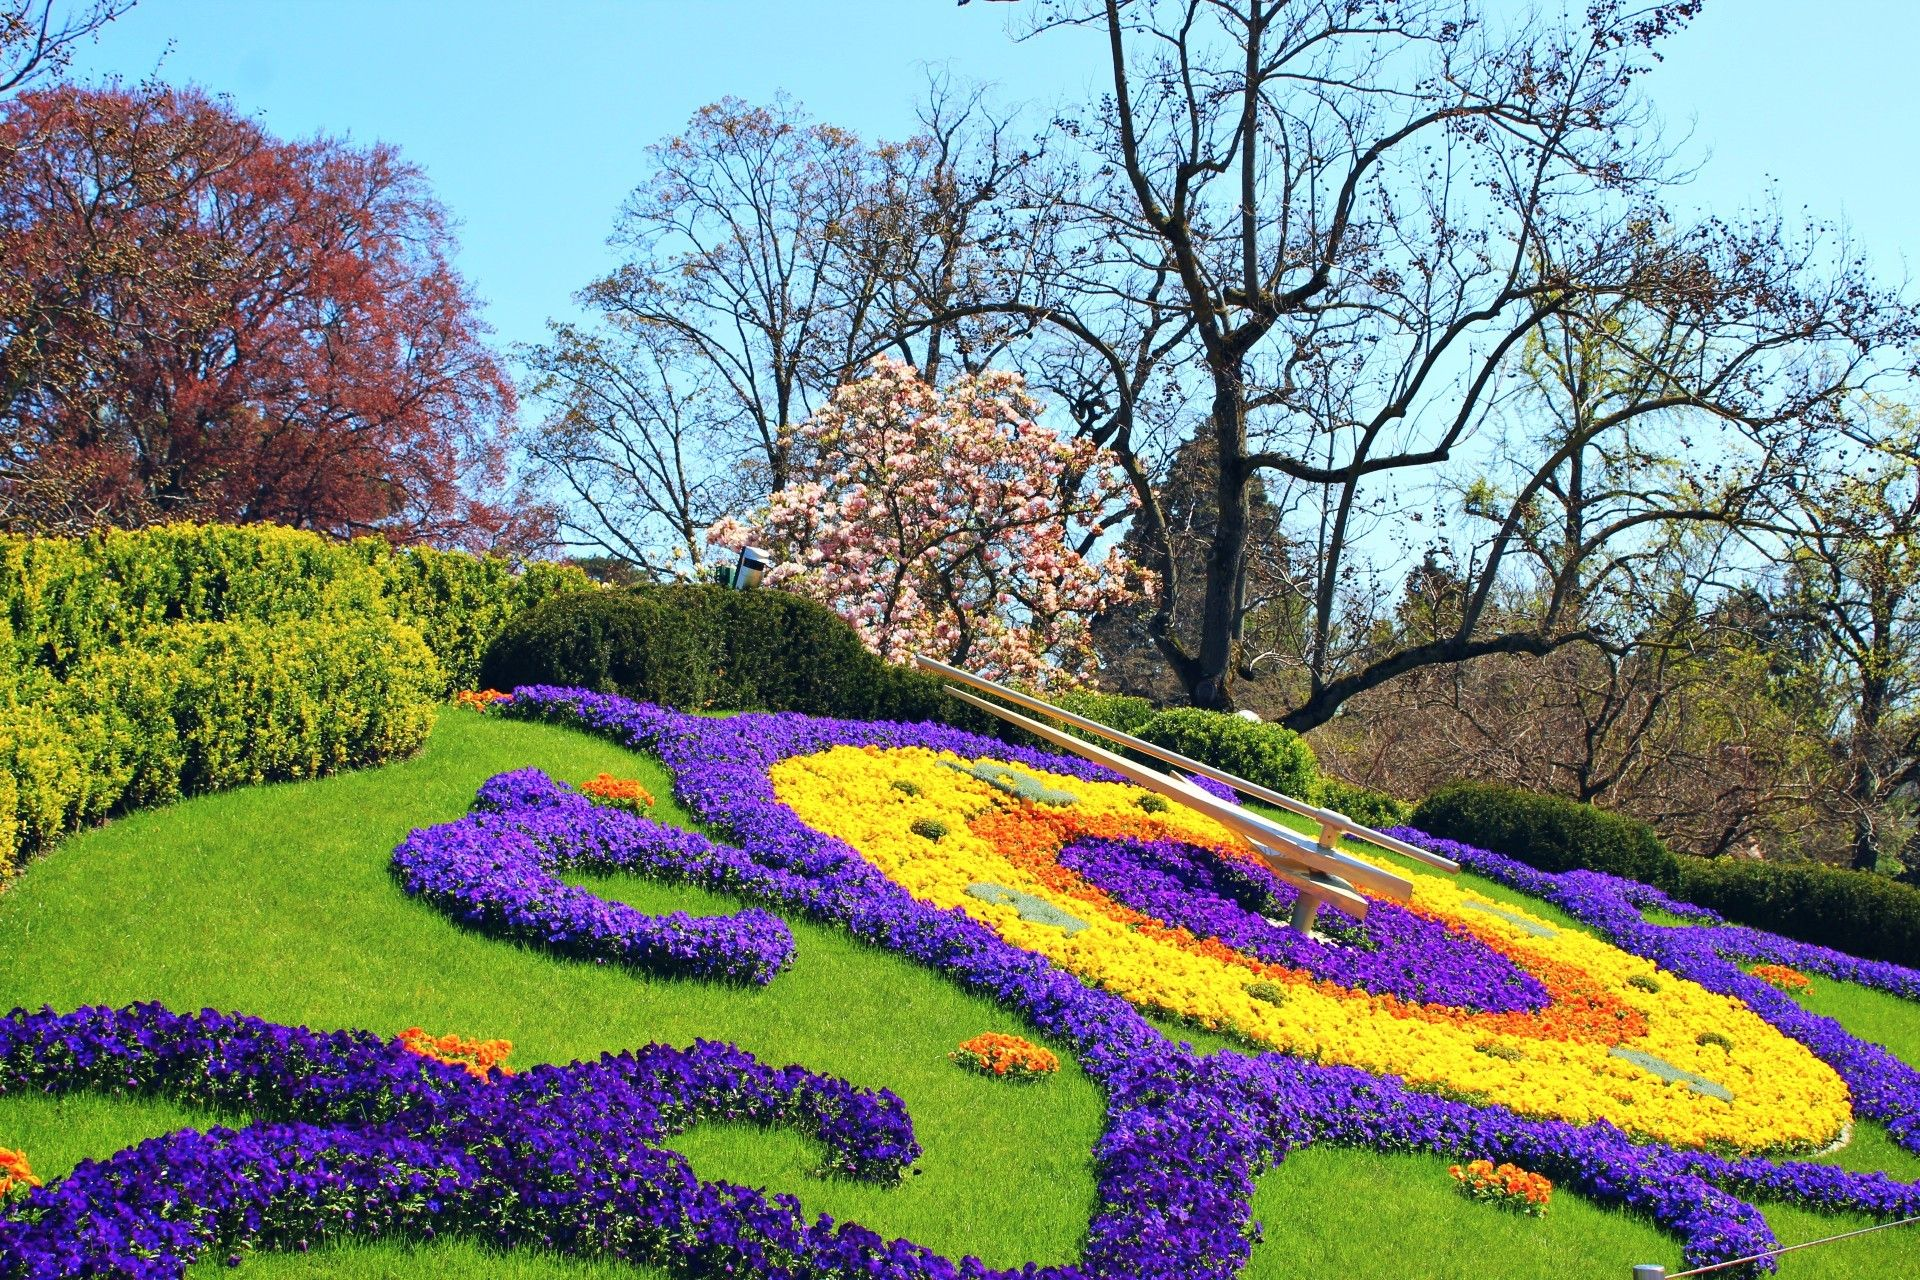 L Horloge Fleurie Jardin Anglais Geneve Jardin Anglais Horloge Fleurie Jardins